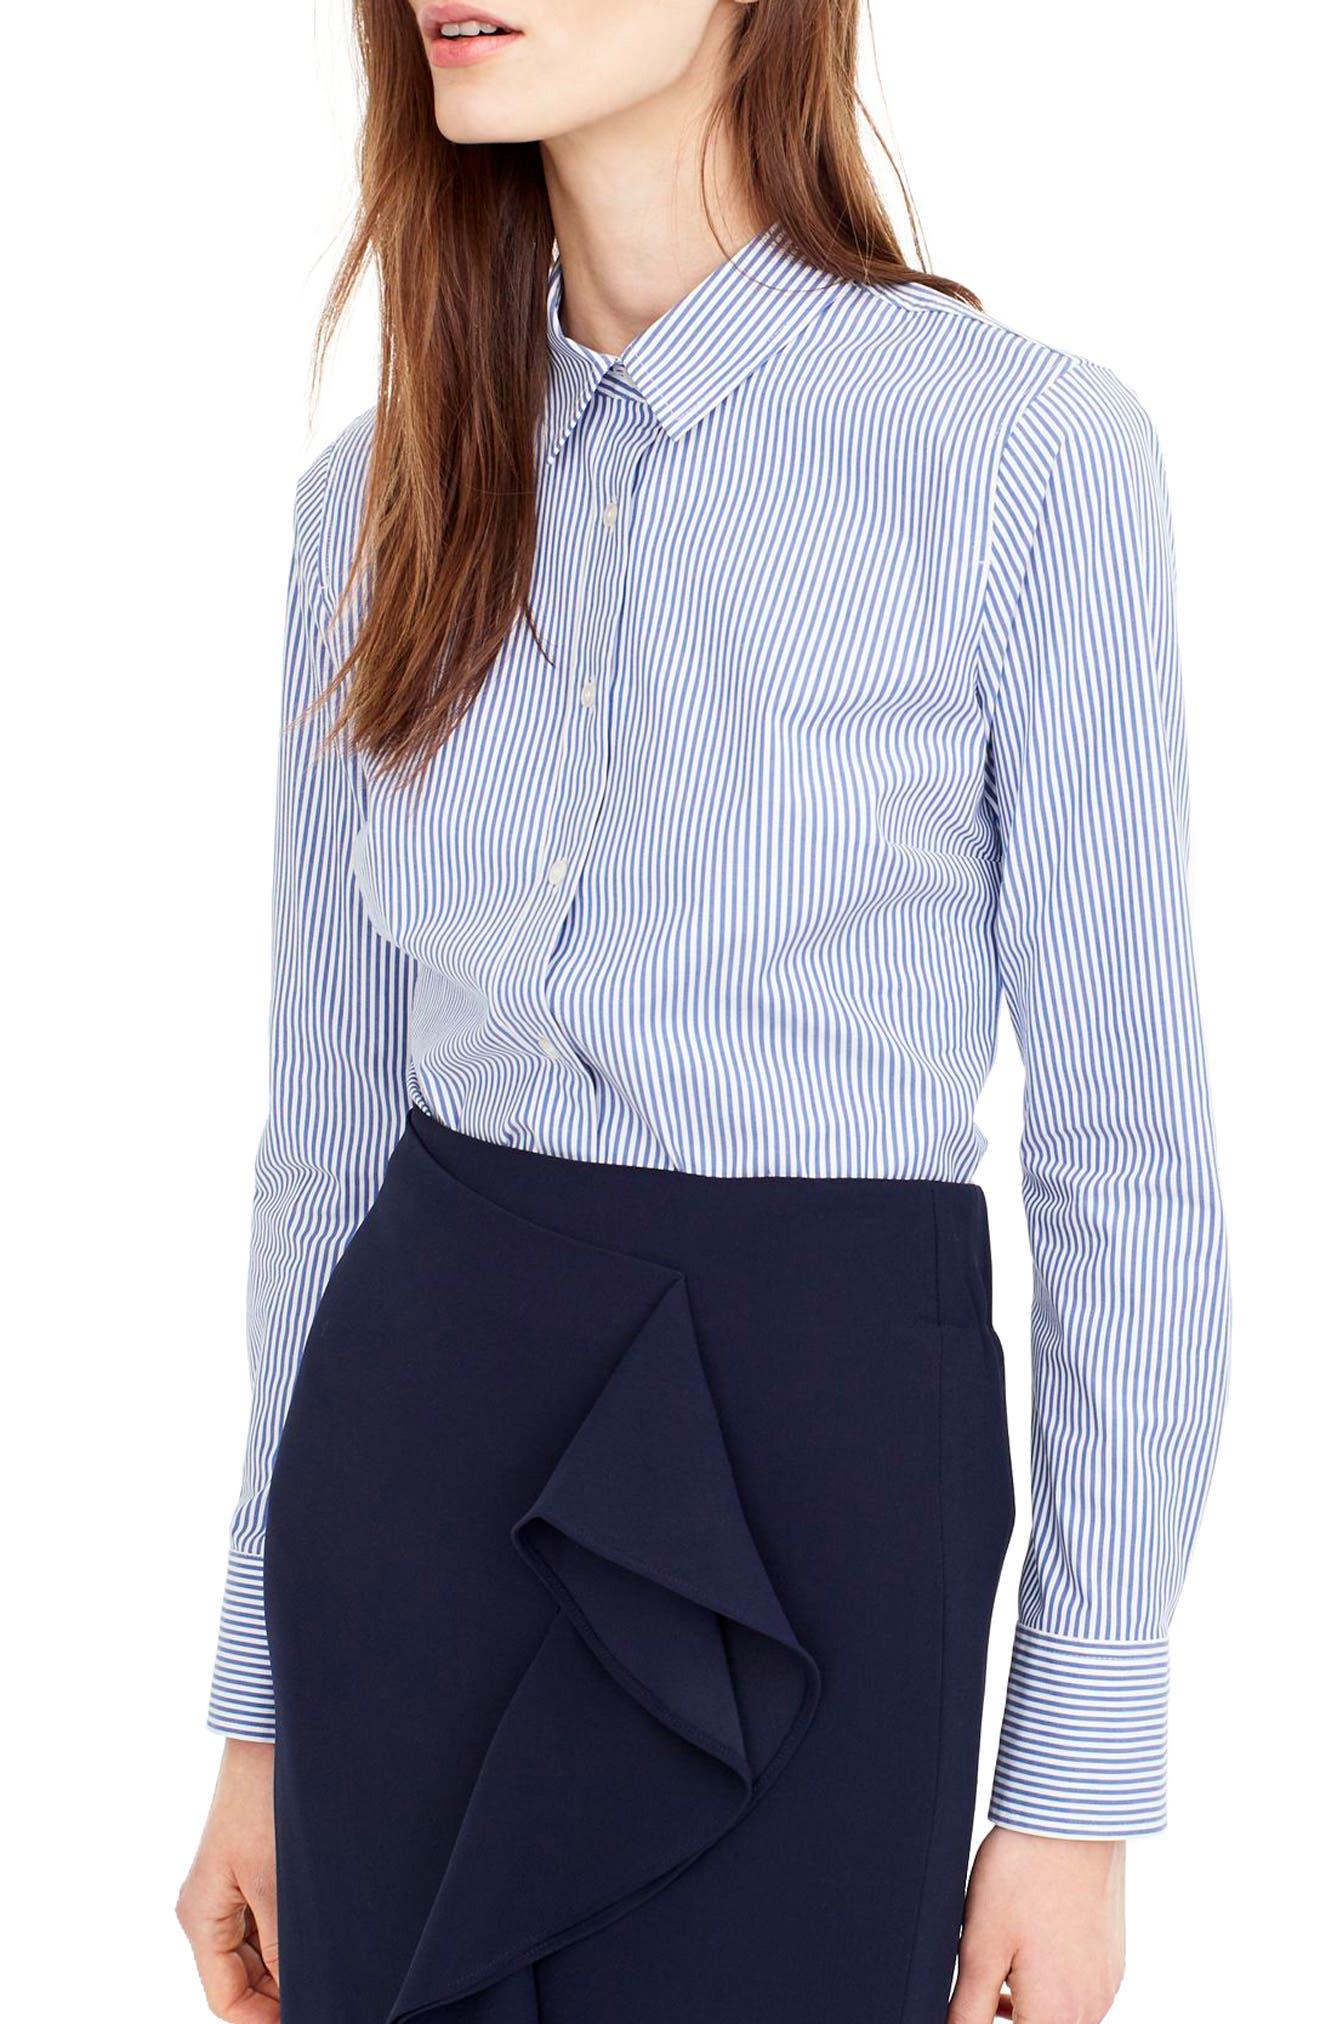 J.Crew Classic Stripe Stretch Perfect Cotton Shirt (Regular & Petite)